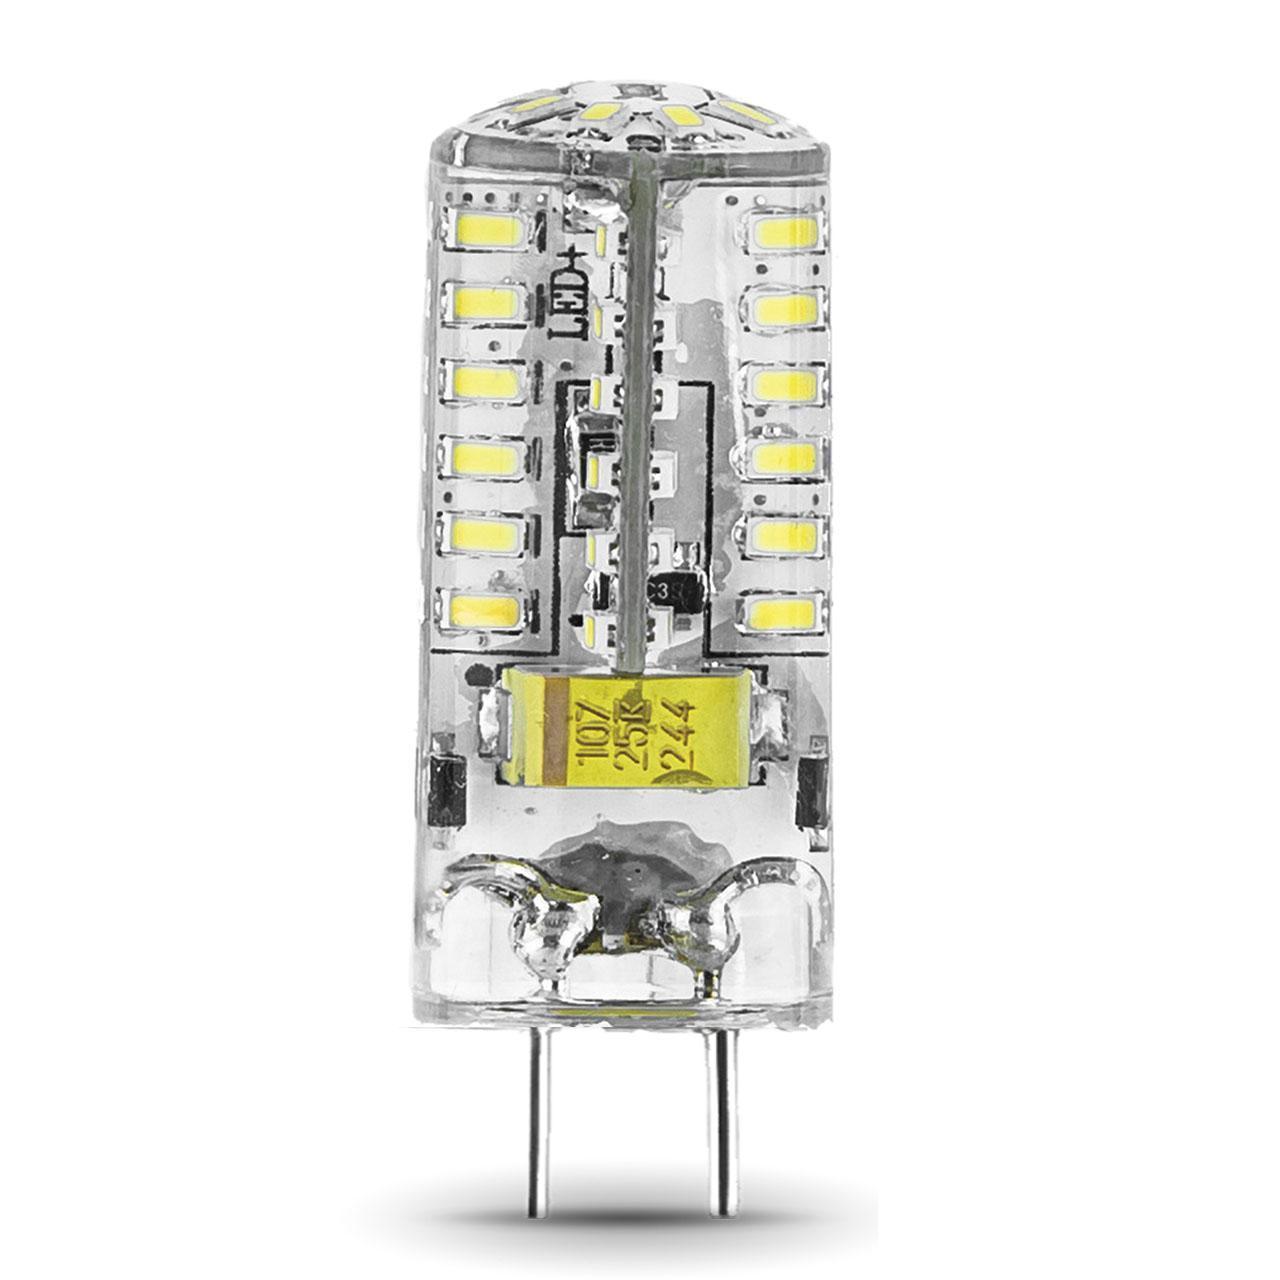 Лампа светодиодная GY6.35 3W 4100K прозрачная 107719203